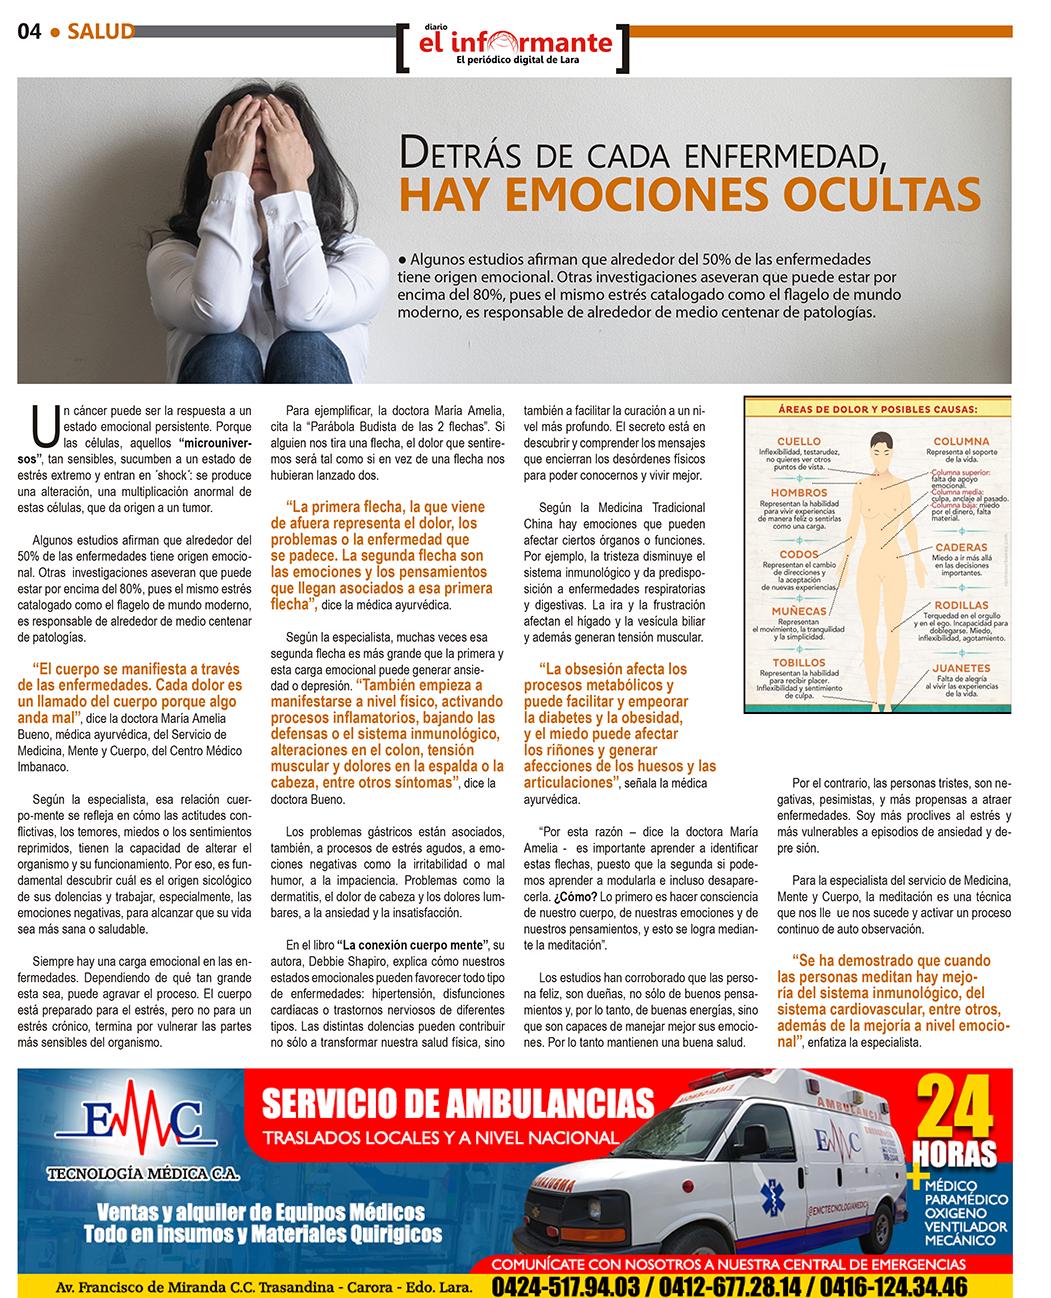 GUIA MEDICA EI INFORMANTE 11-05-2021